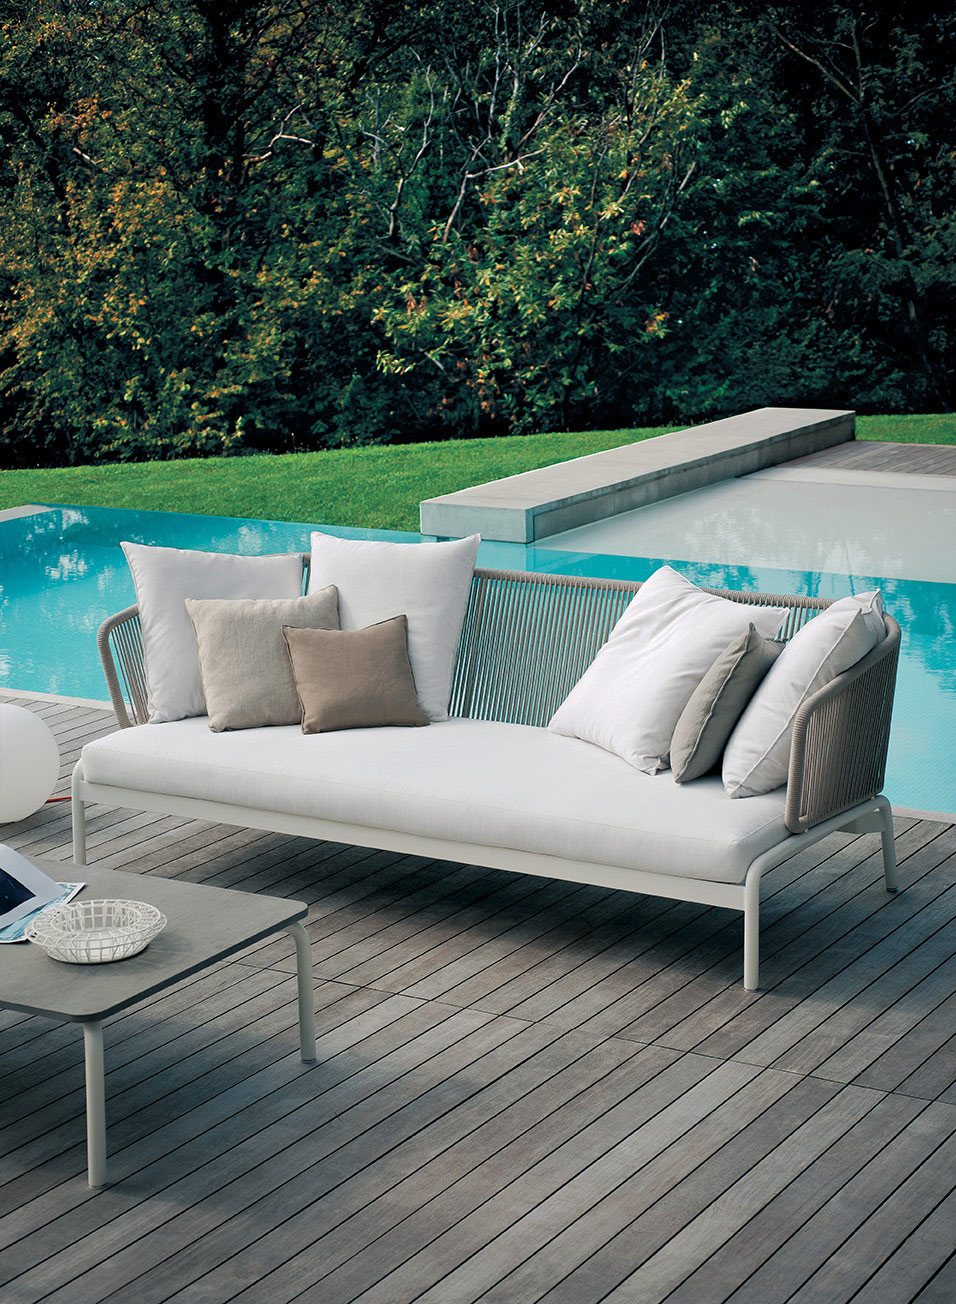 Designmoebelagentur_RODA_SPOOL-003-sofa_milk_sand_RODA_low.jpg